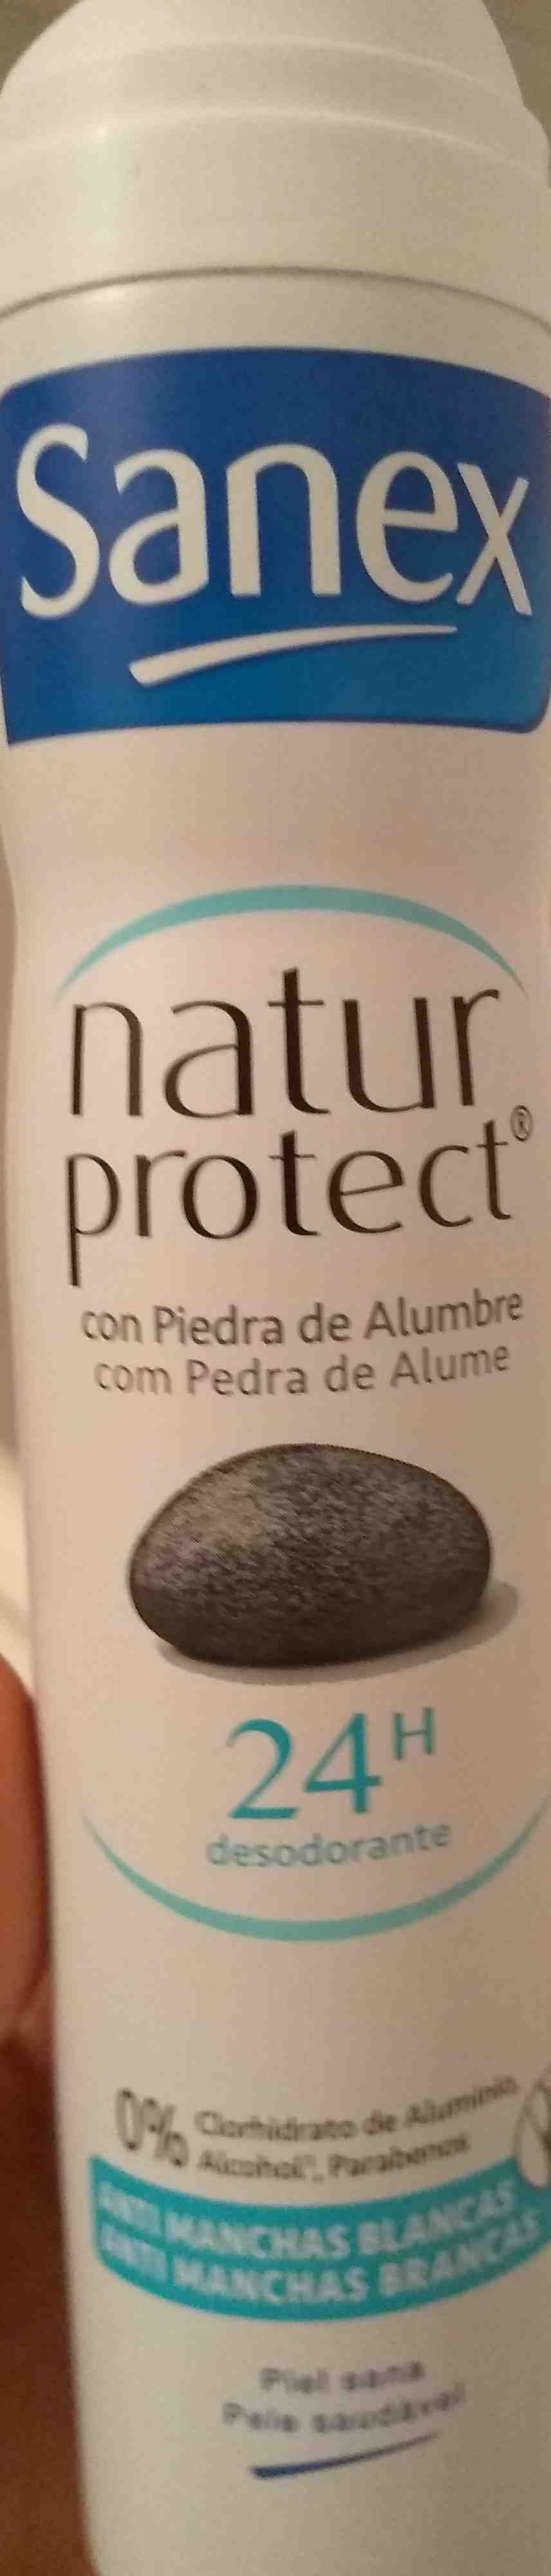 Sanex natural proyect desodorante - Product